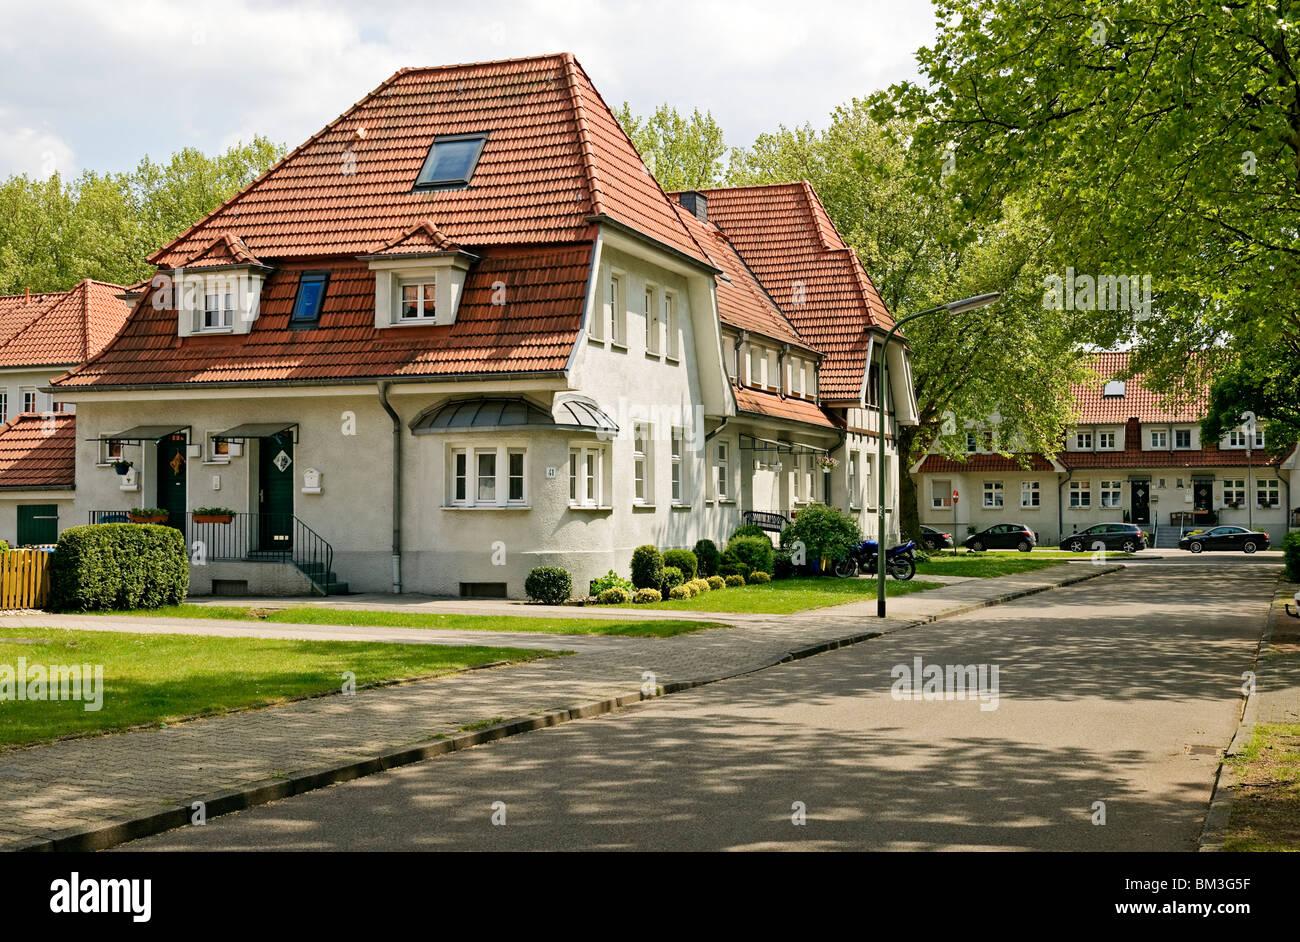 Industrial housing estate Bottrop-Welheim from 1914-23, Ruhrgebiet, North Rhine Westphalia, Germany, Europe. - Stock Image